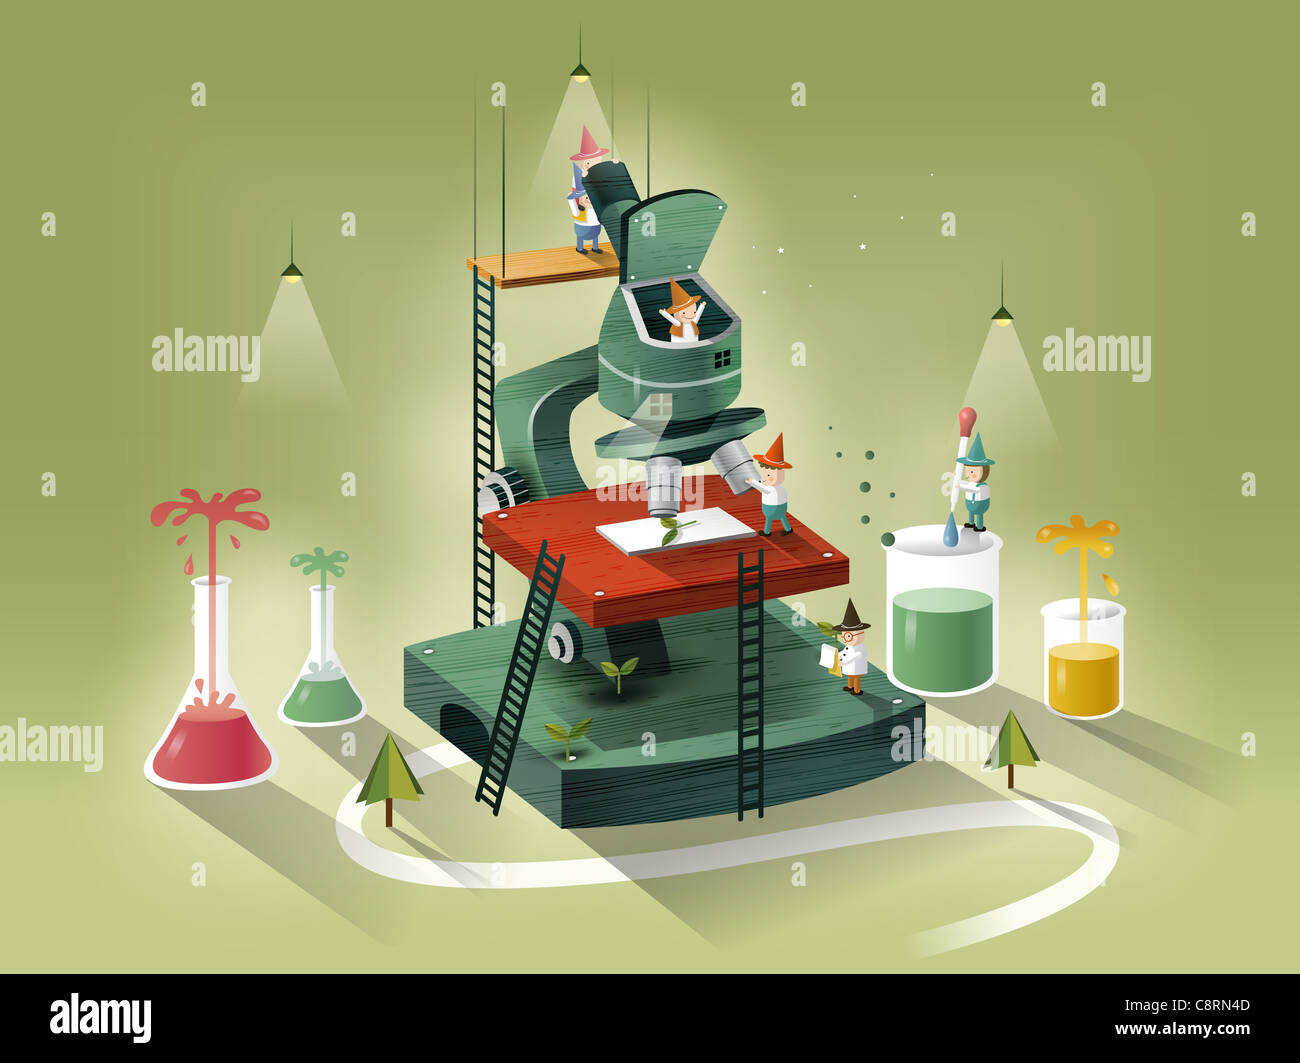 People On Microscope - Stock Image